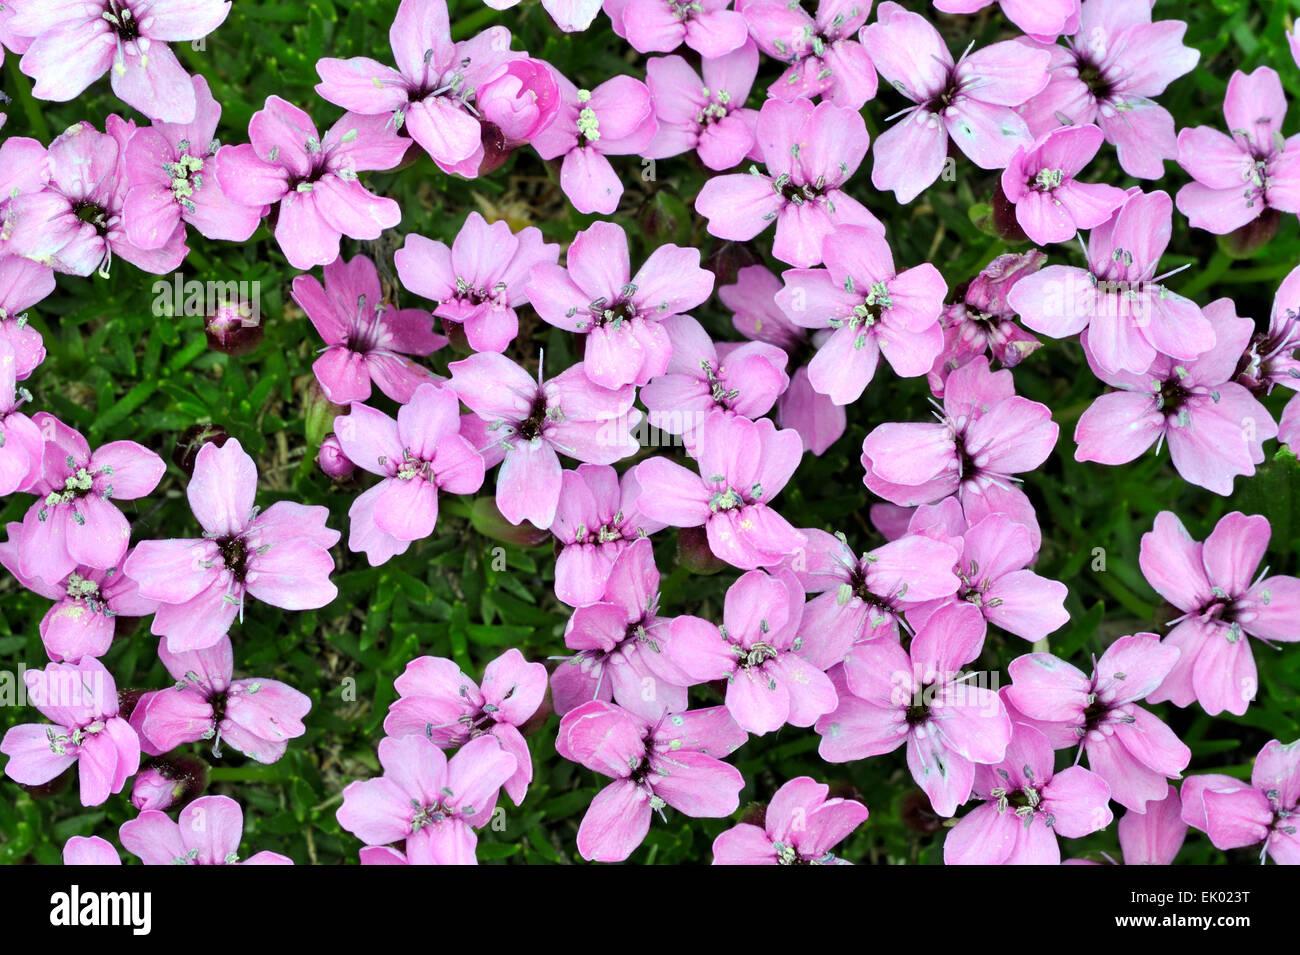 Cushion pink silene acaulis stock photos cushion pink silene moss campion cushion pink silene acaulis in flower stock image mightylinksfo